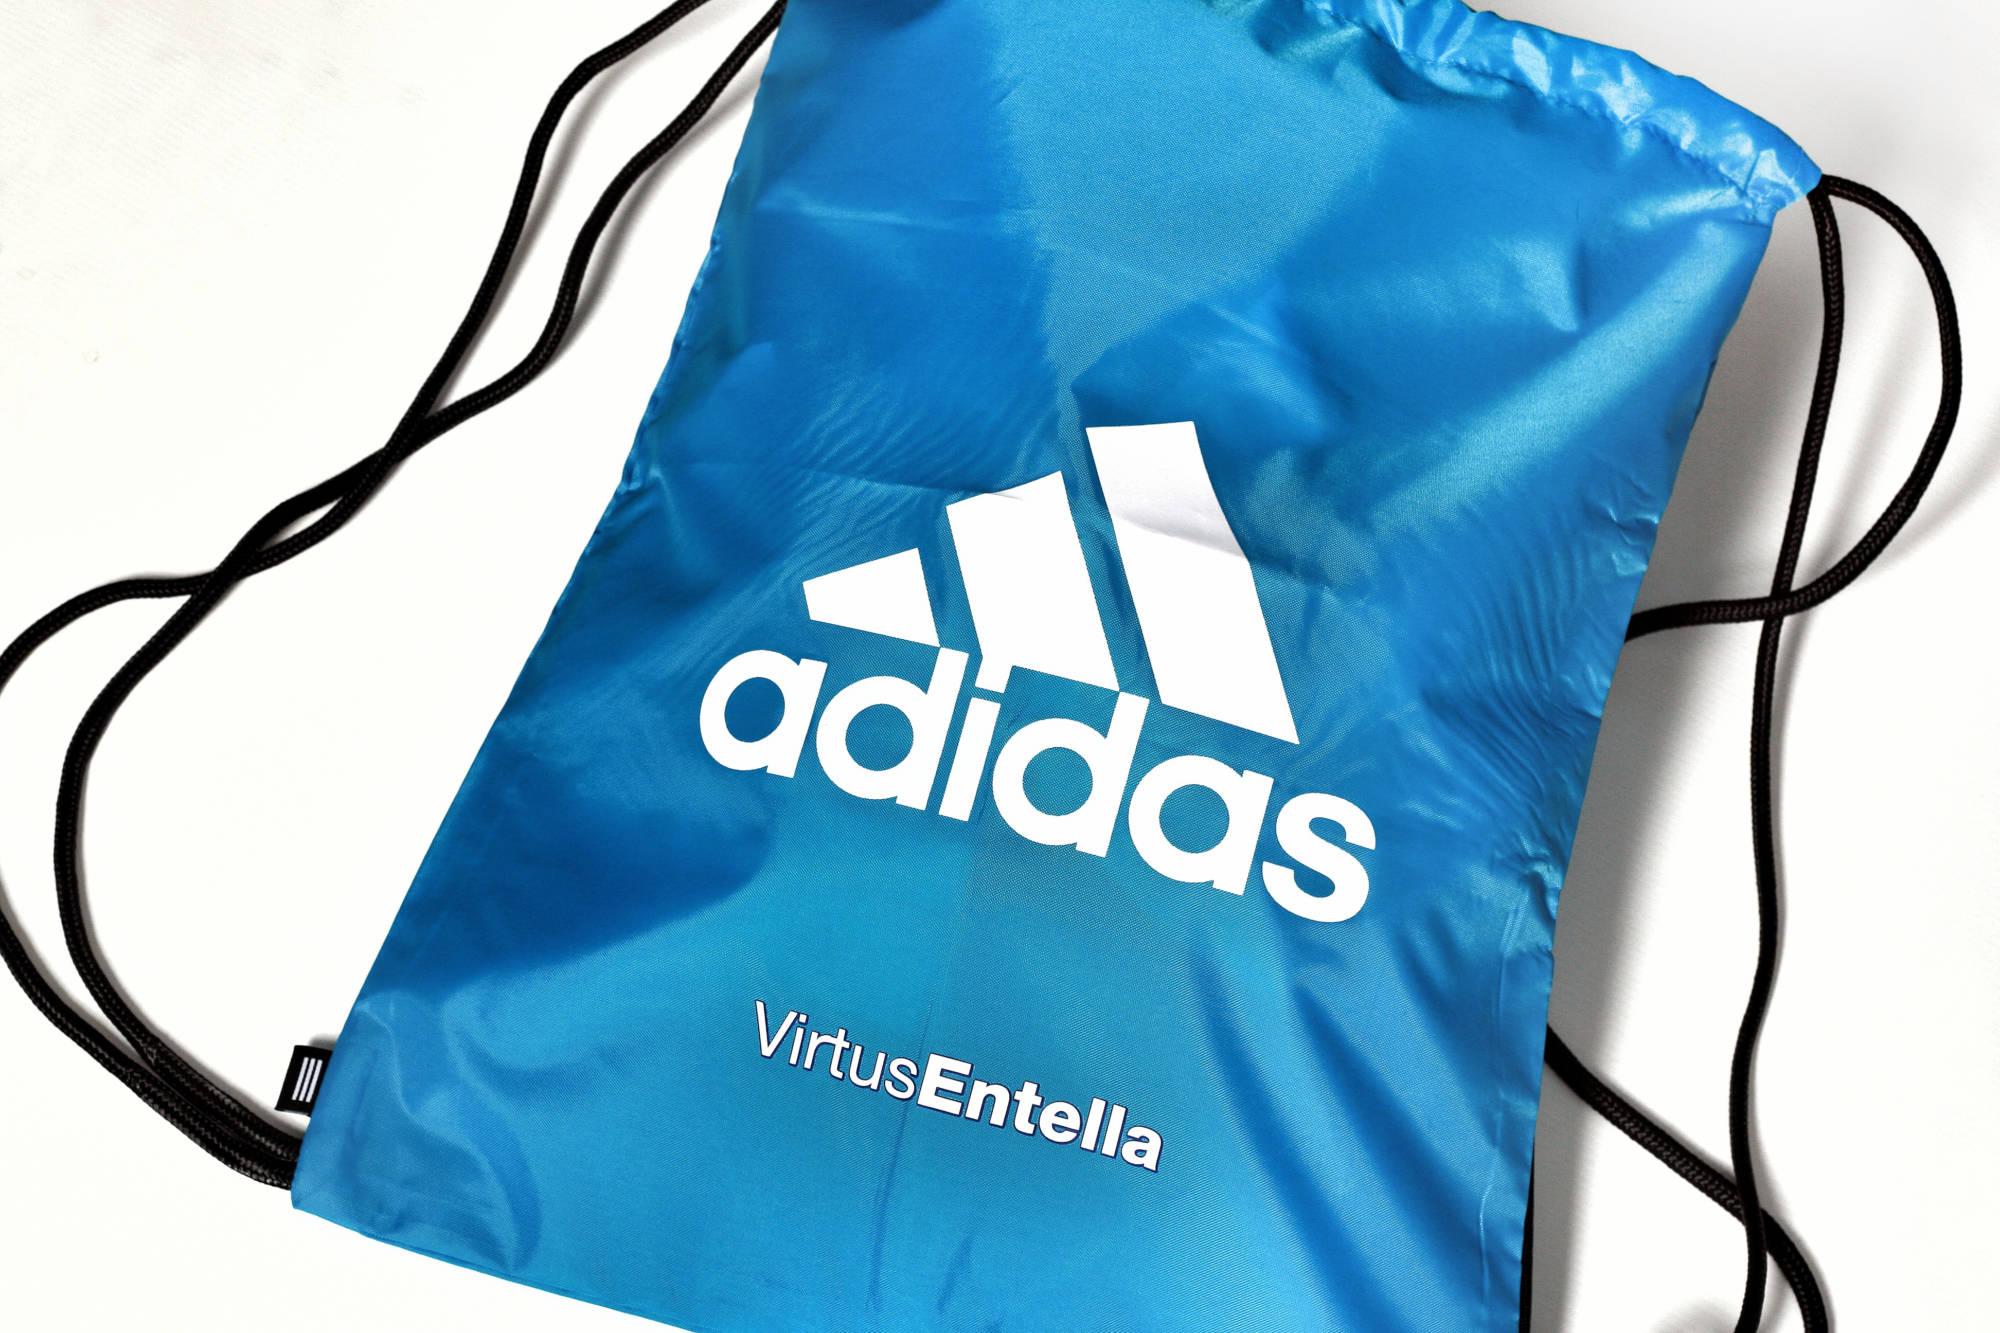 Portascarpe Adidas Celeste - Virtus Entella Store